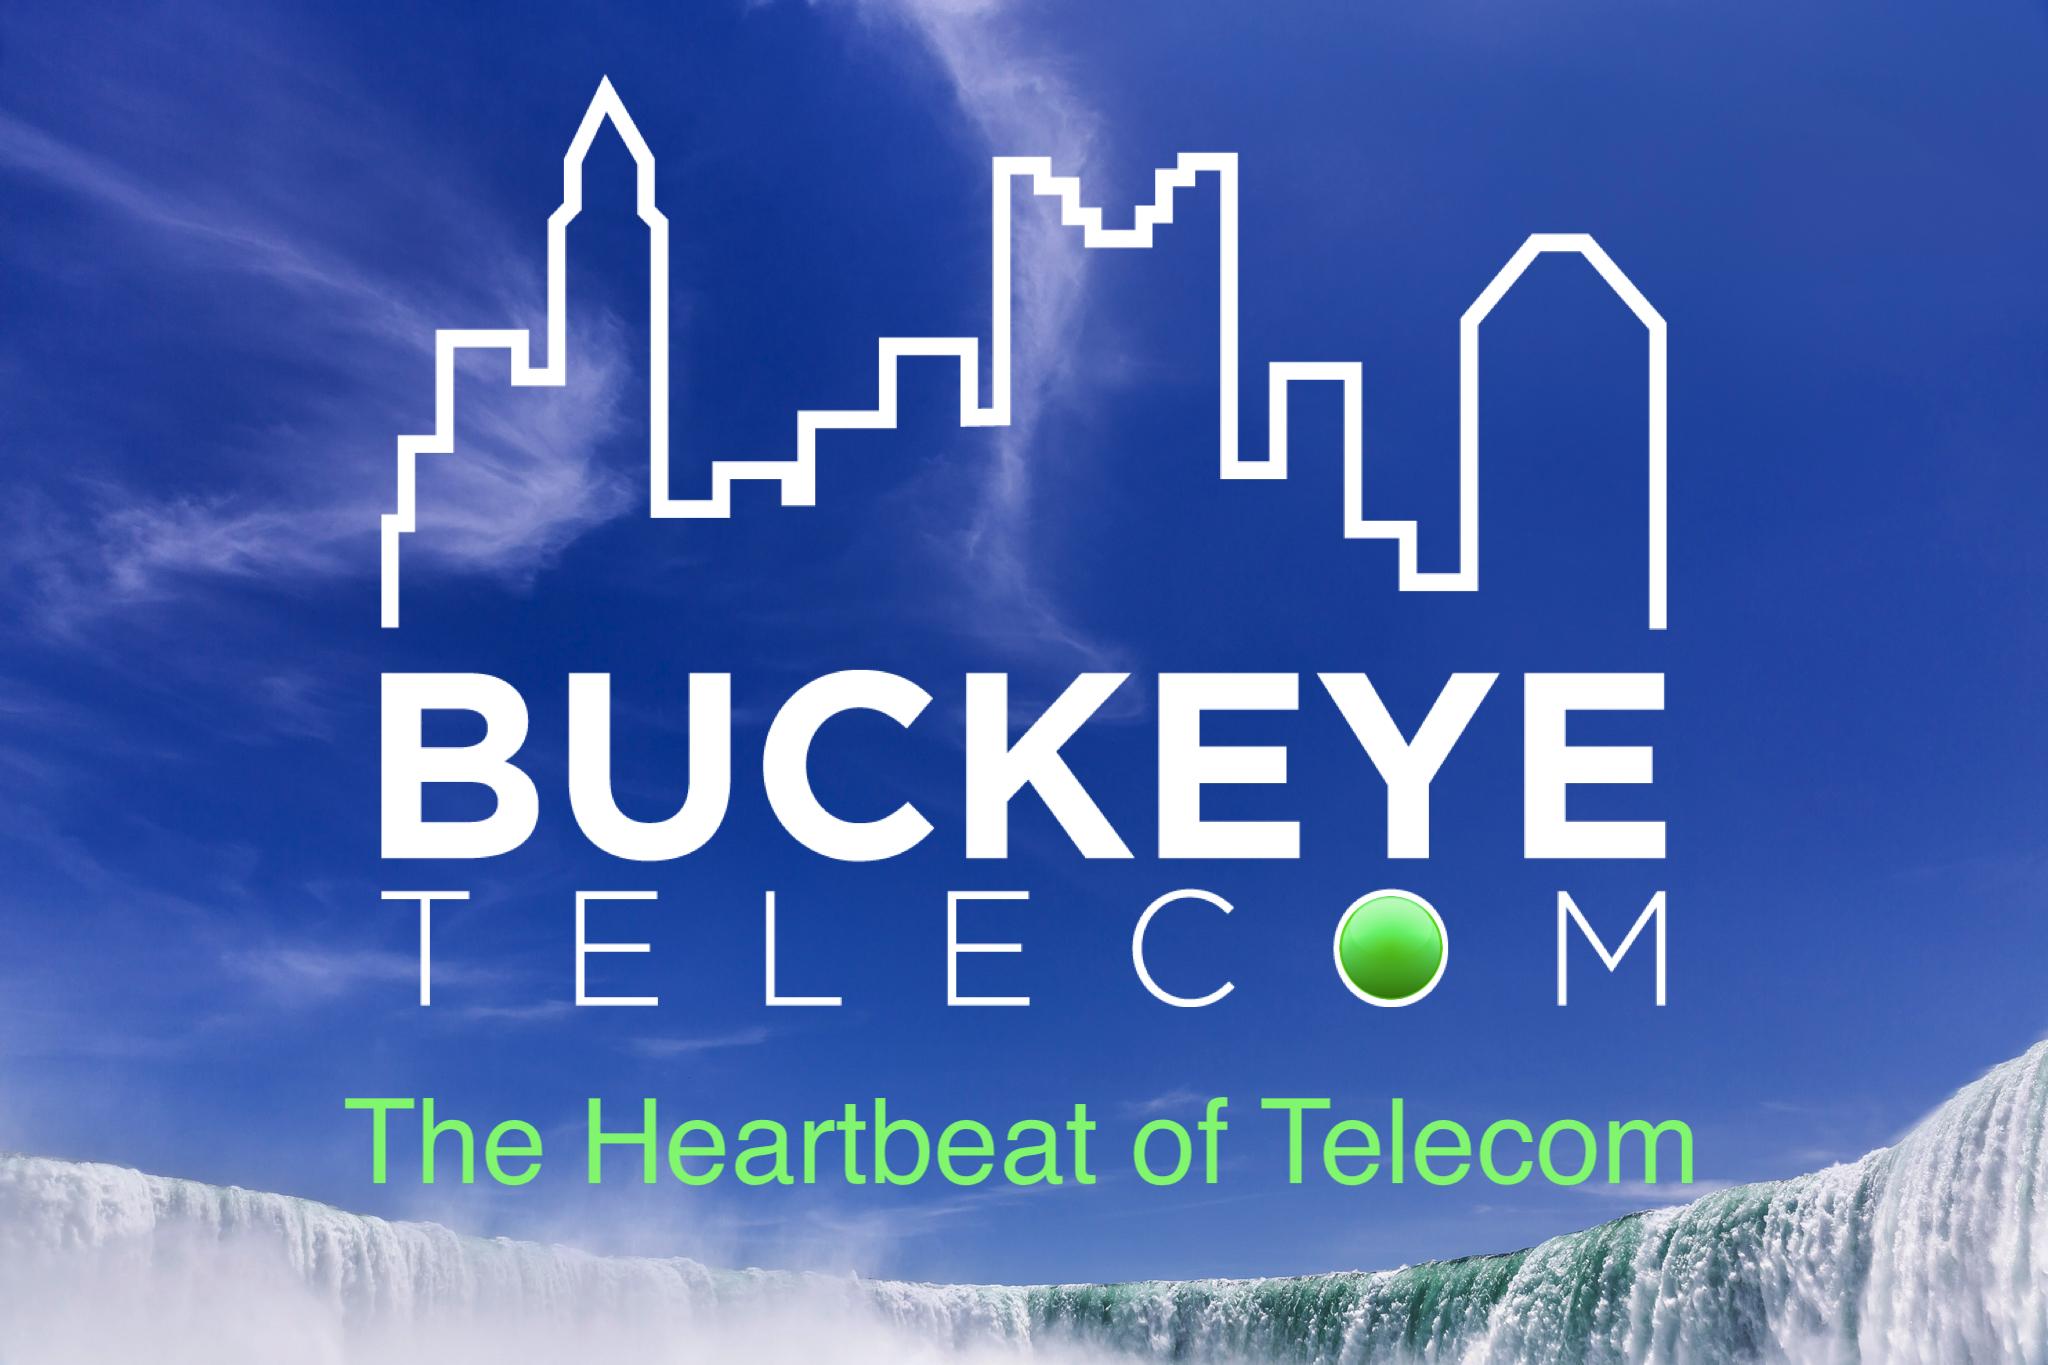 Buckeye-White-Heartbeat-Green-Cloud_001.jpg